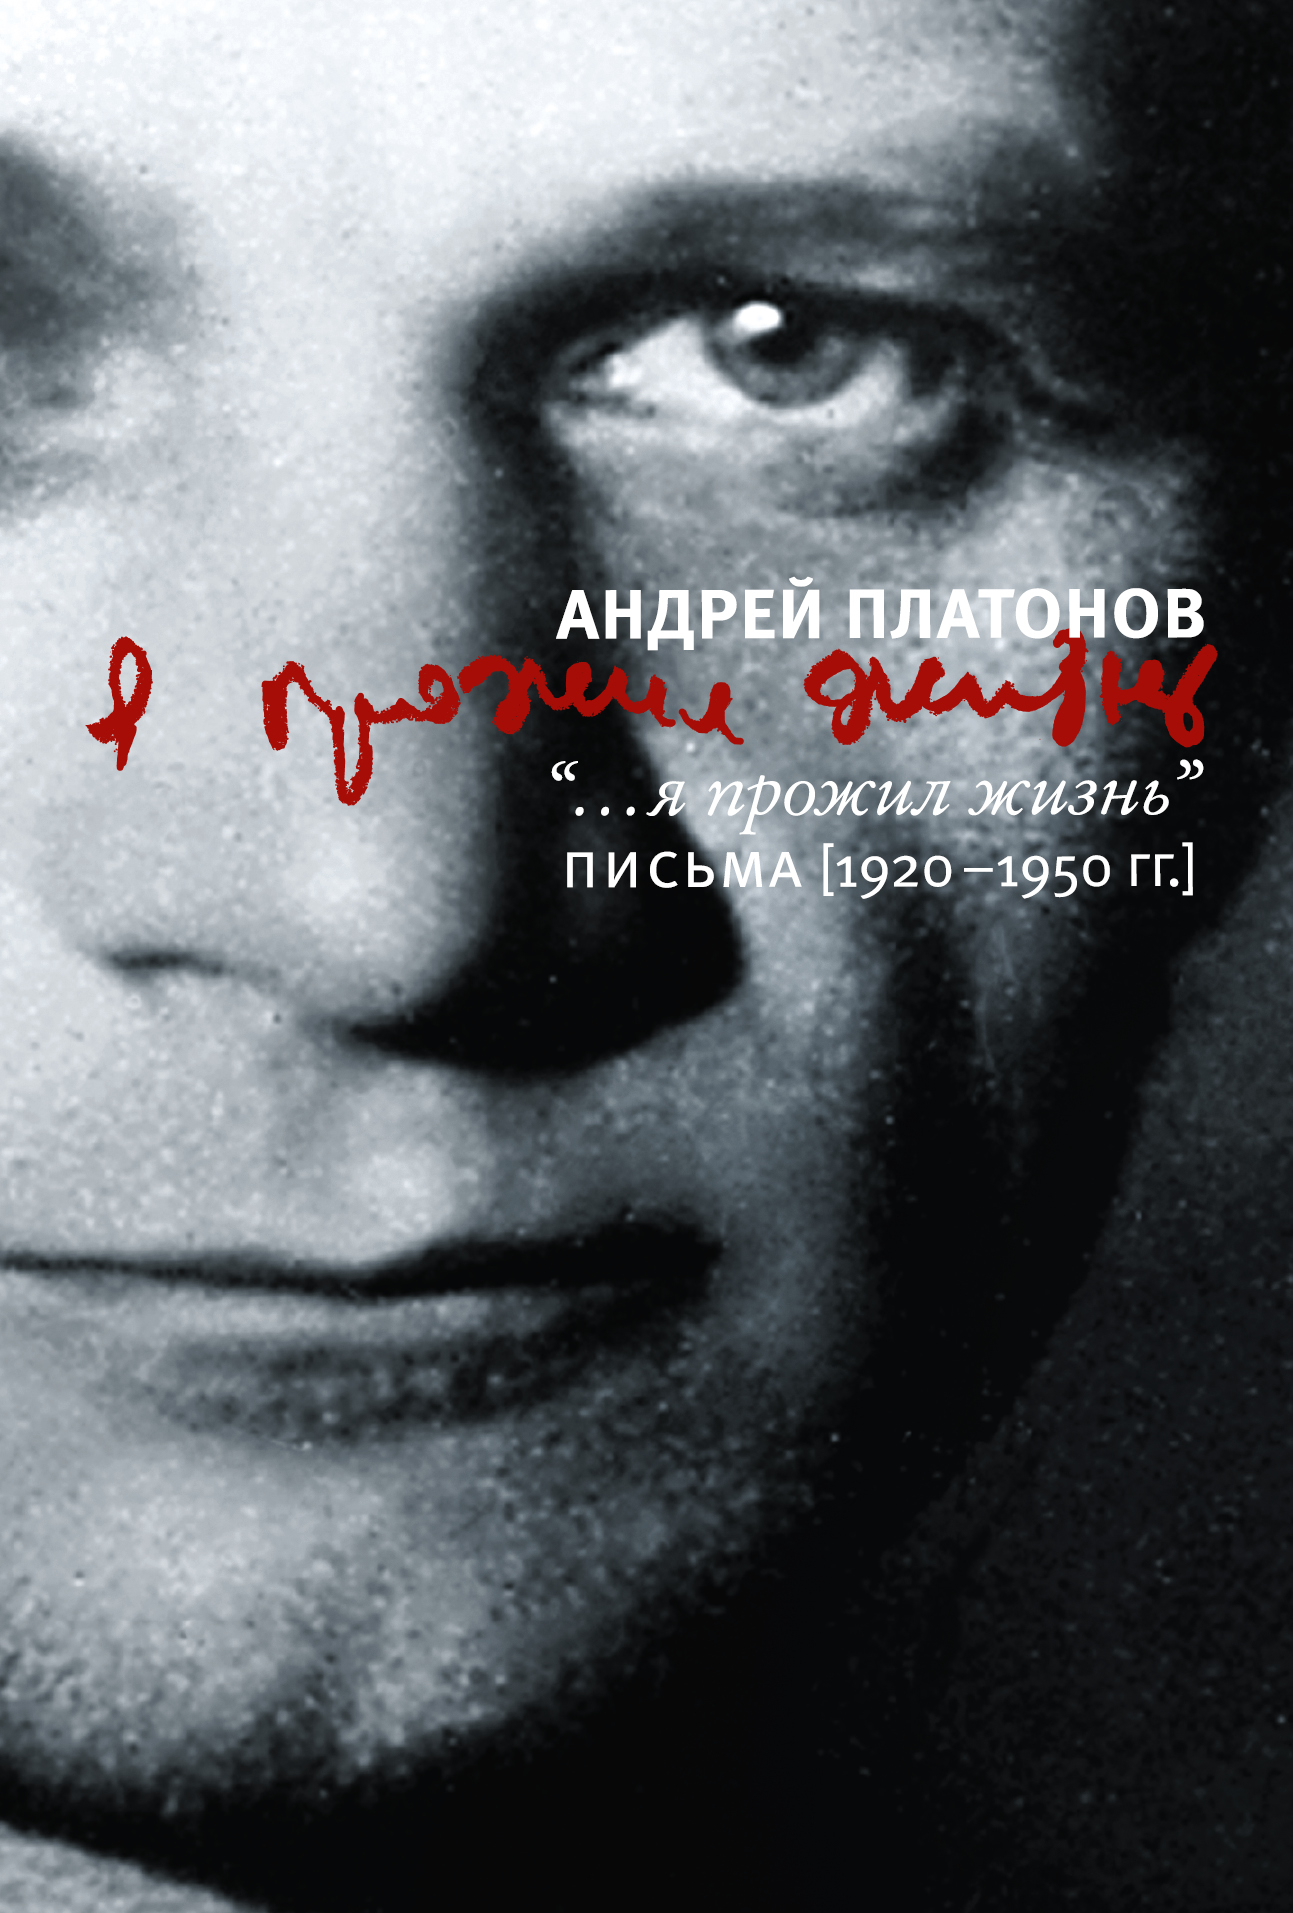 Я прожил жизнь. Письма. 1920-1950 гг. от book24.ru